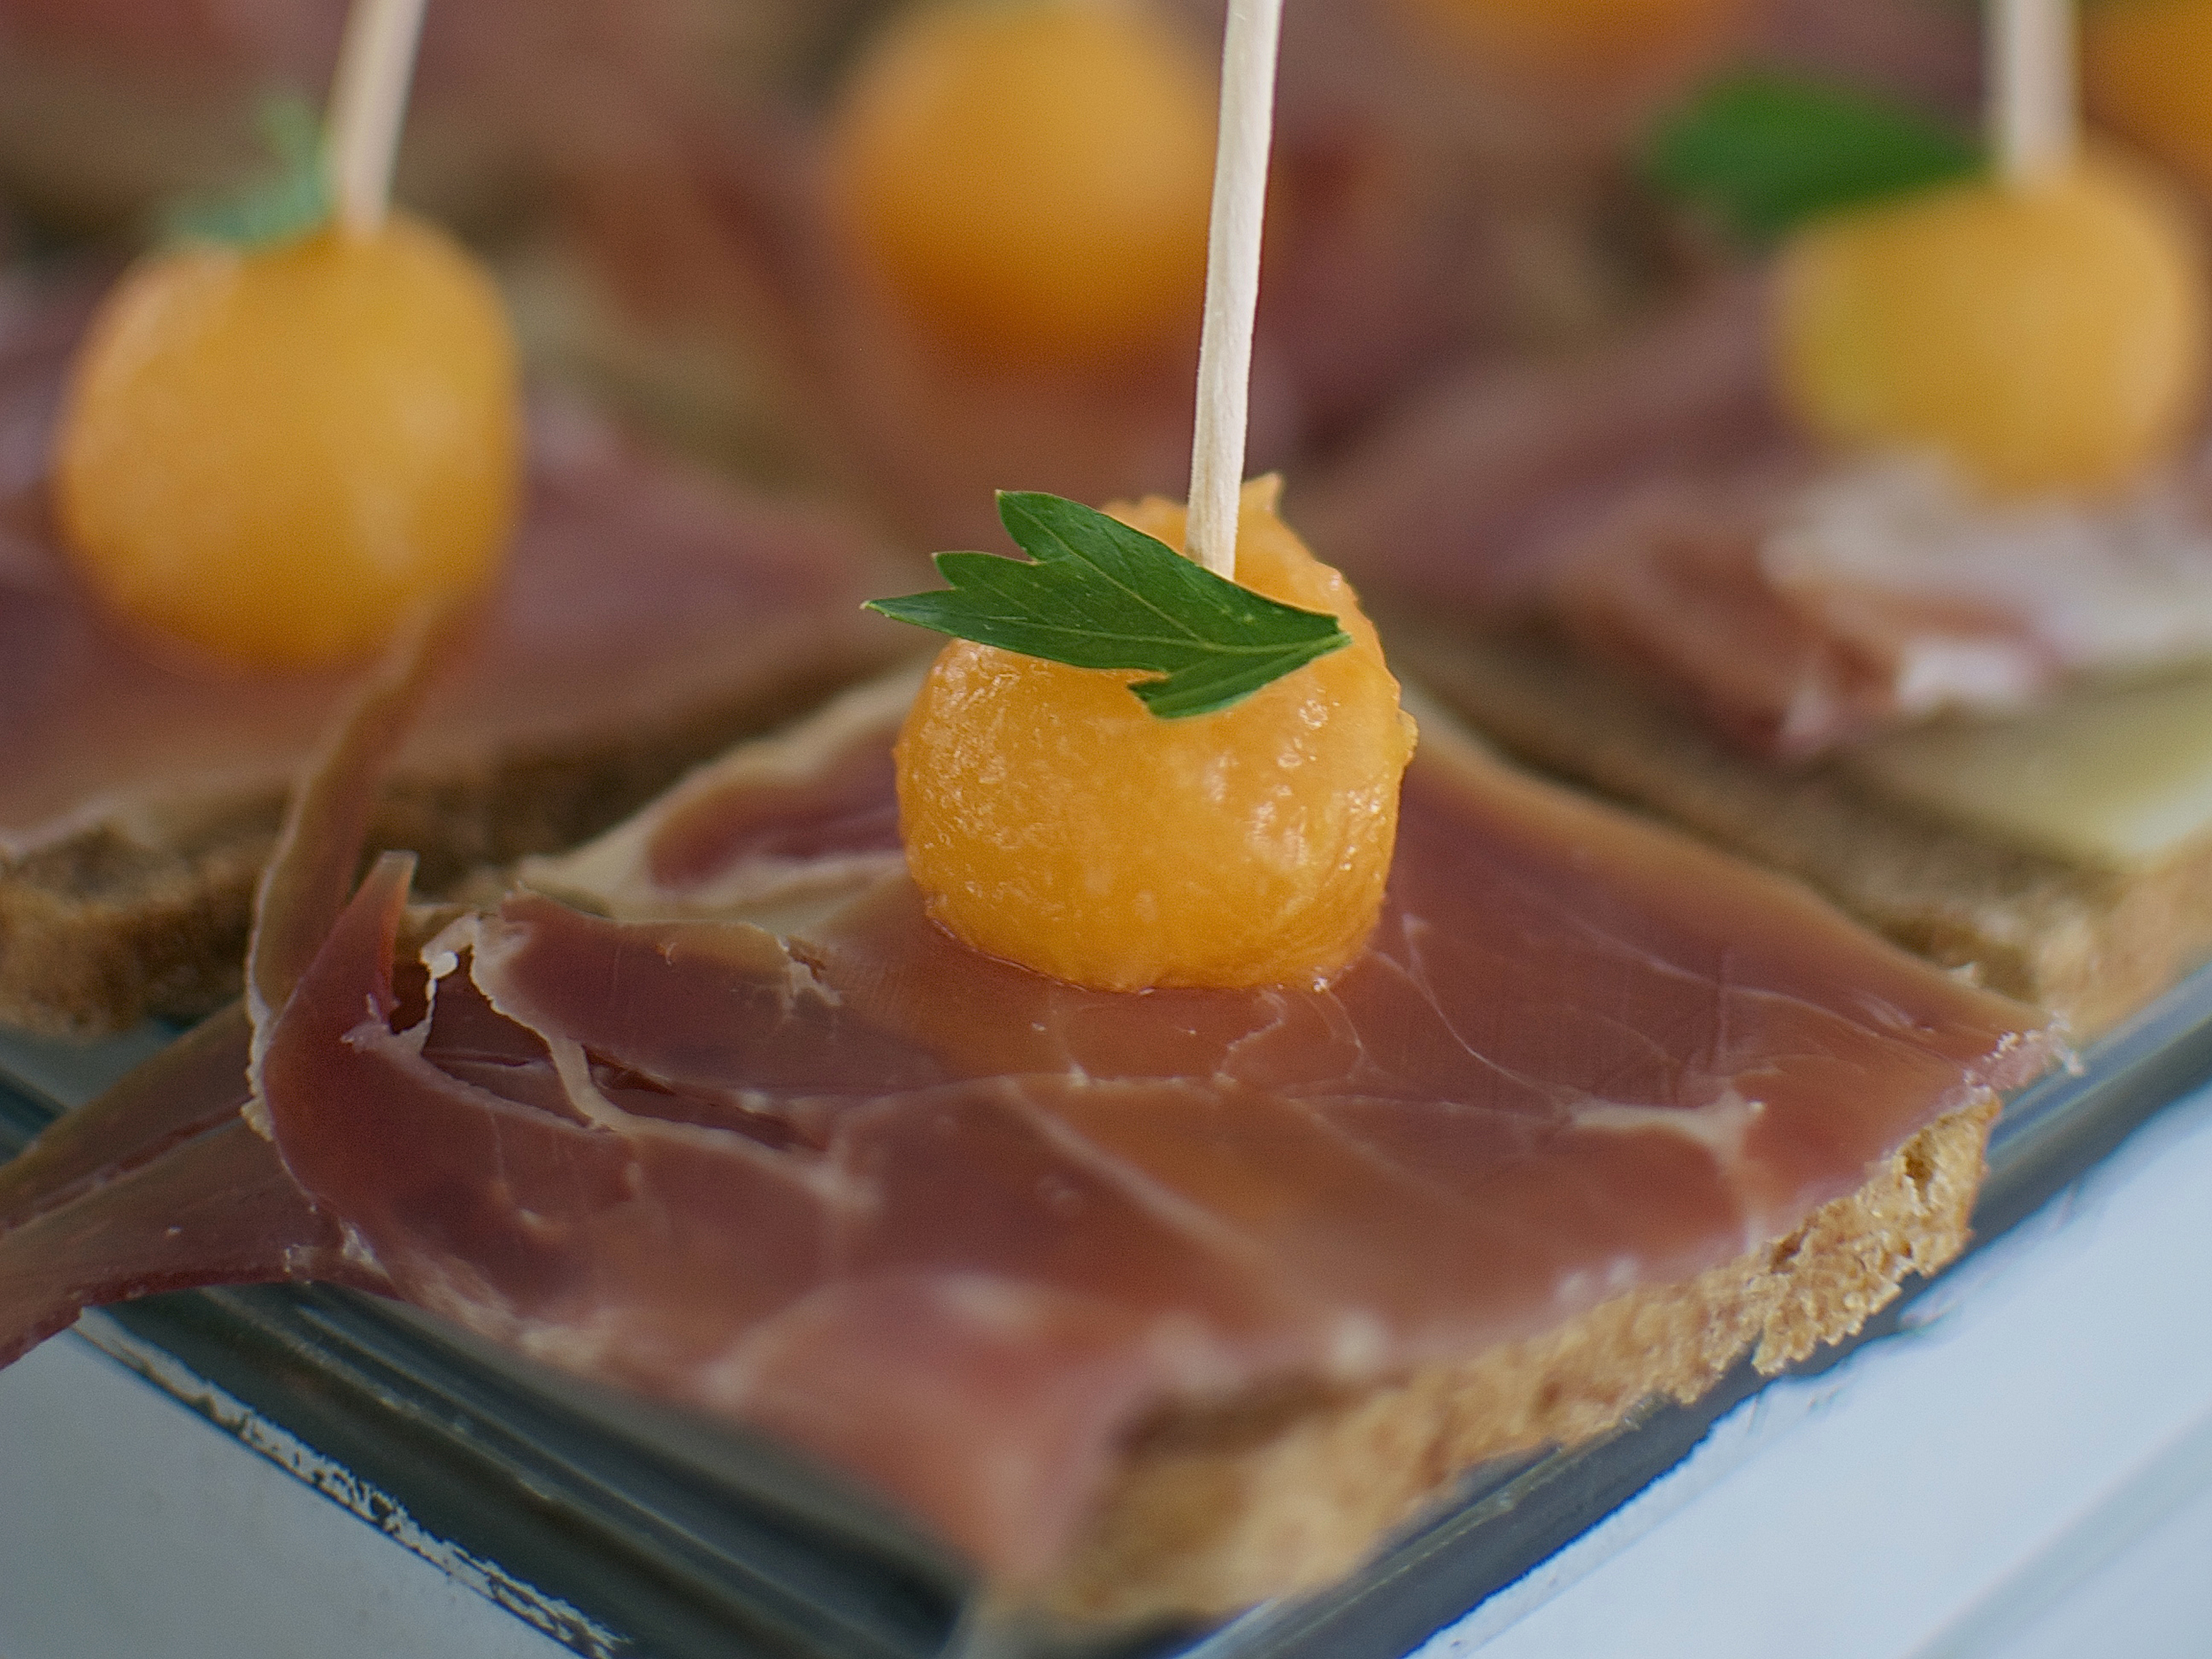 Tapas de Jamón Serrano  Pan de centeno, jamón serrano, queso suizo y melón. (MÍNIMO 25 PIEZAS) PRECIO POR PIEZA  $ 17.00